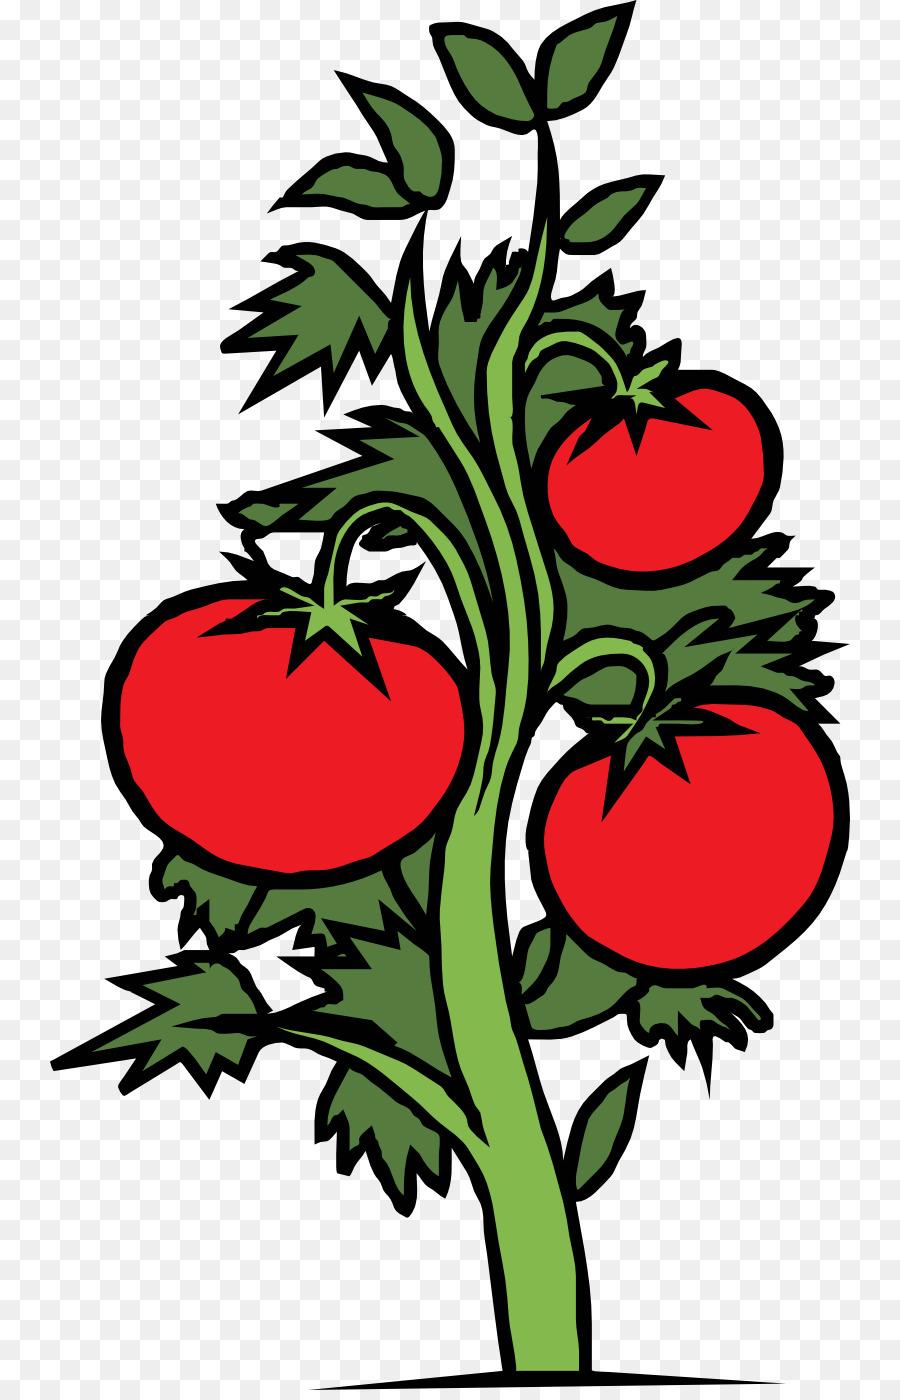 Tomatoes clipart eggplant plant. Floral flower background leaf